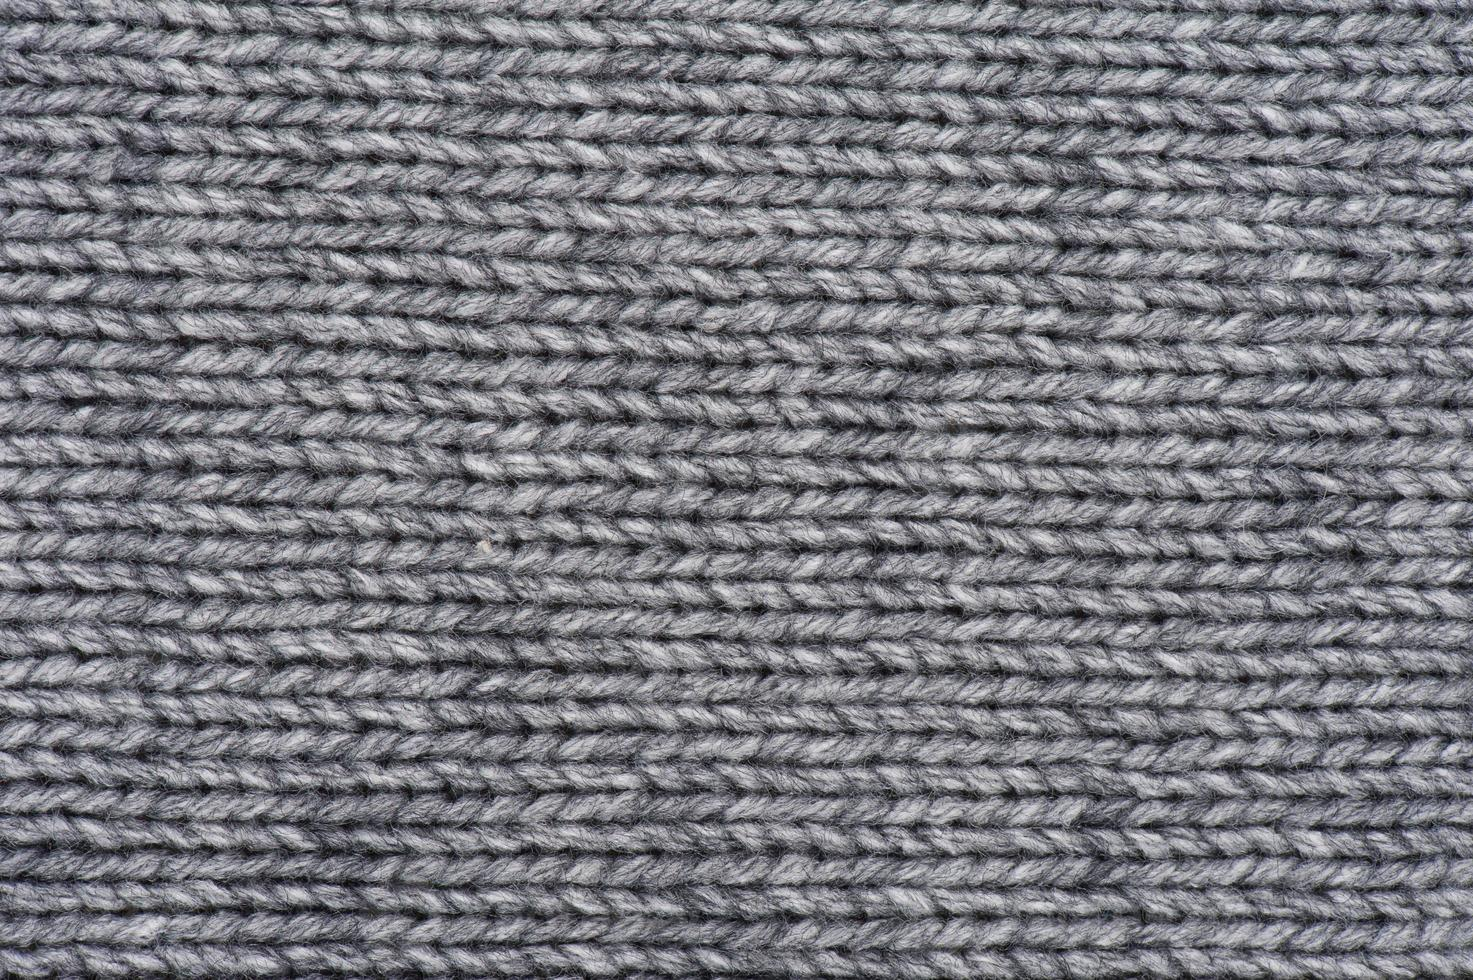 wool texture photo